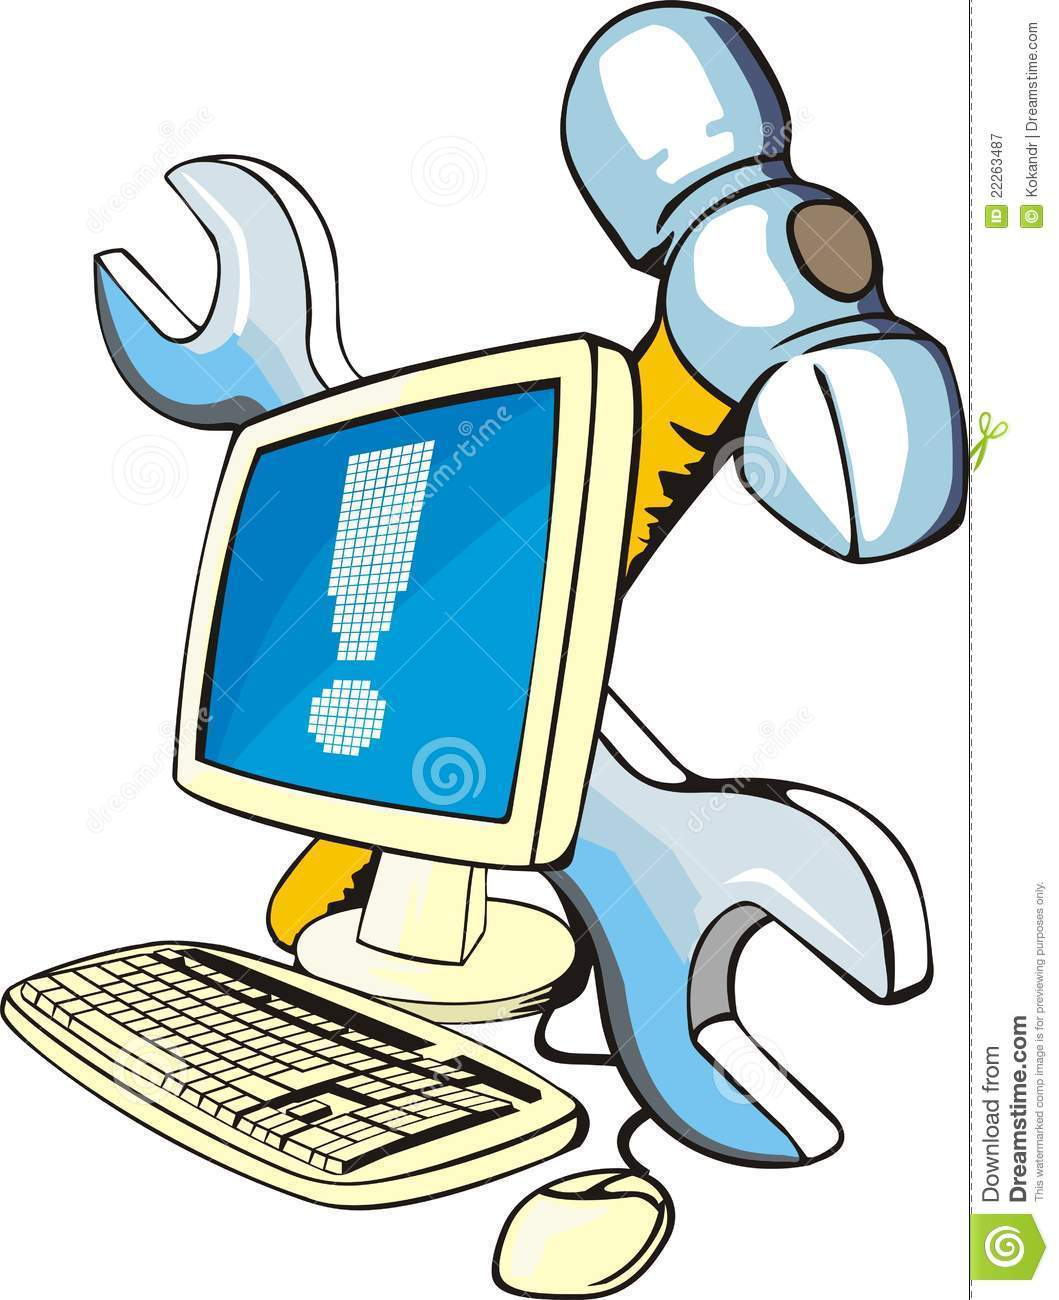 Free funny computer clipart 3 » Clipart Portal.